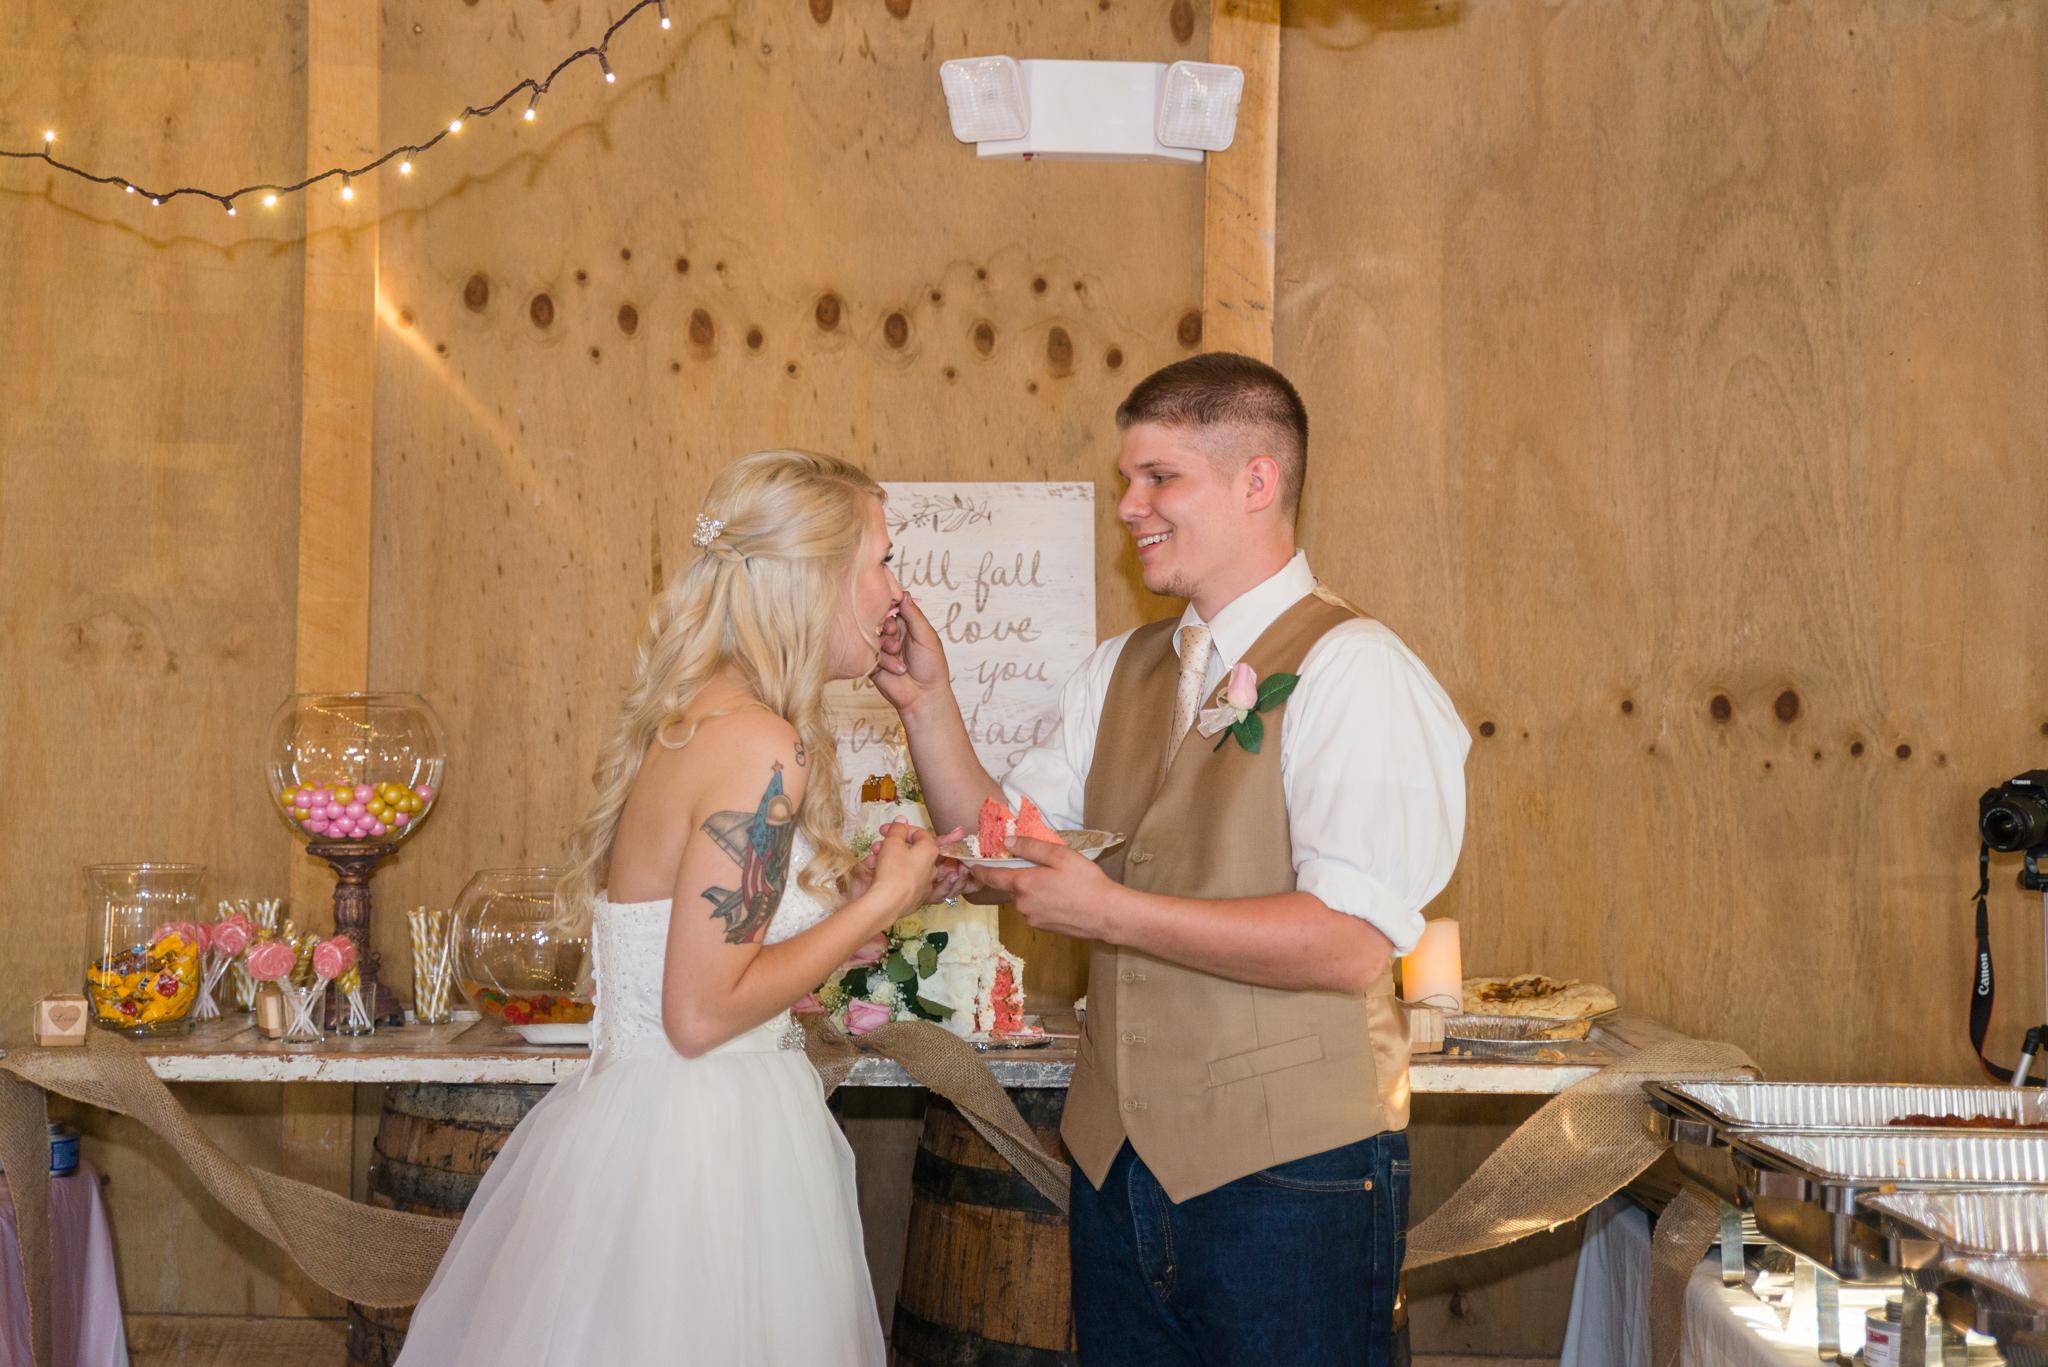 Kentucky, KY wedding, barn wedding, wedding cake, Josephina Event Venue, Dry Ridge, Louisville, Lexington, Somerset, Ashland, Morehead, Winchester, Mt Sterling, West Chester